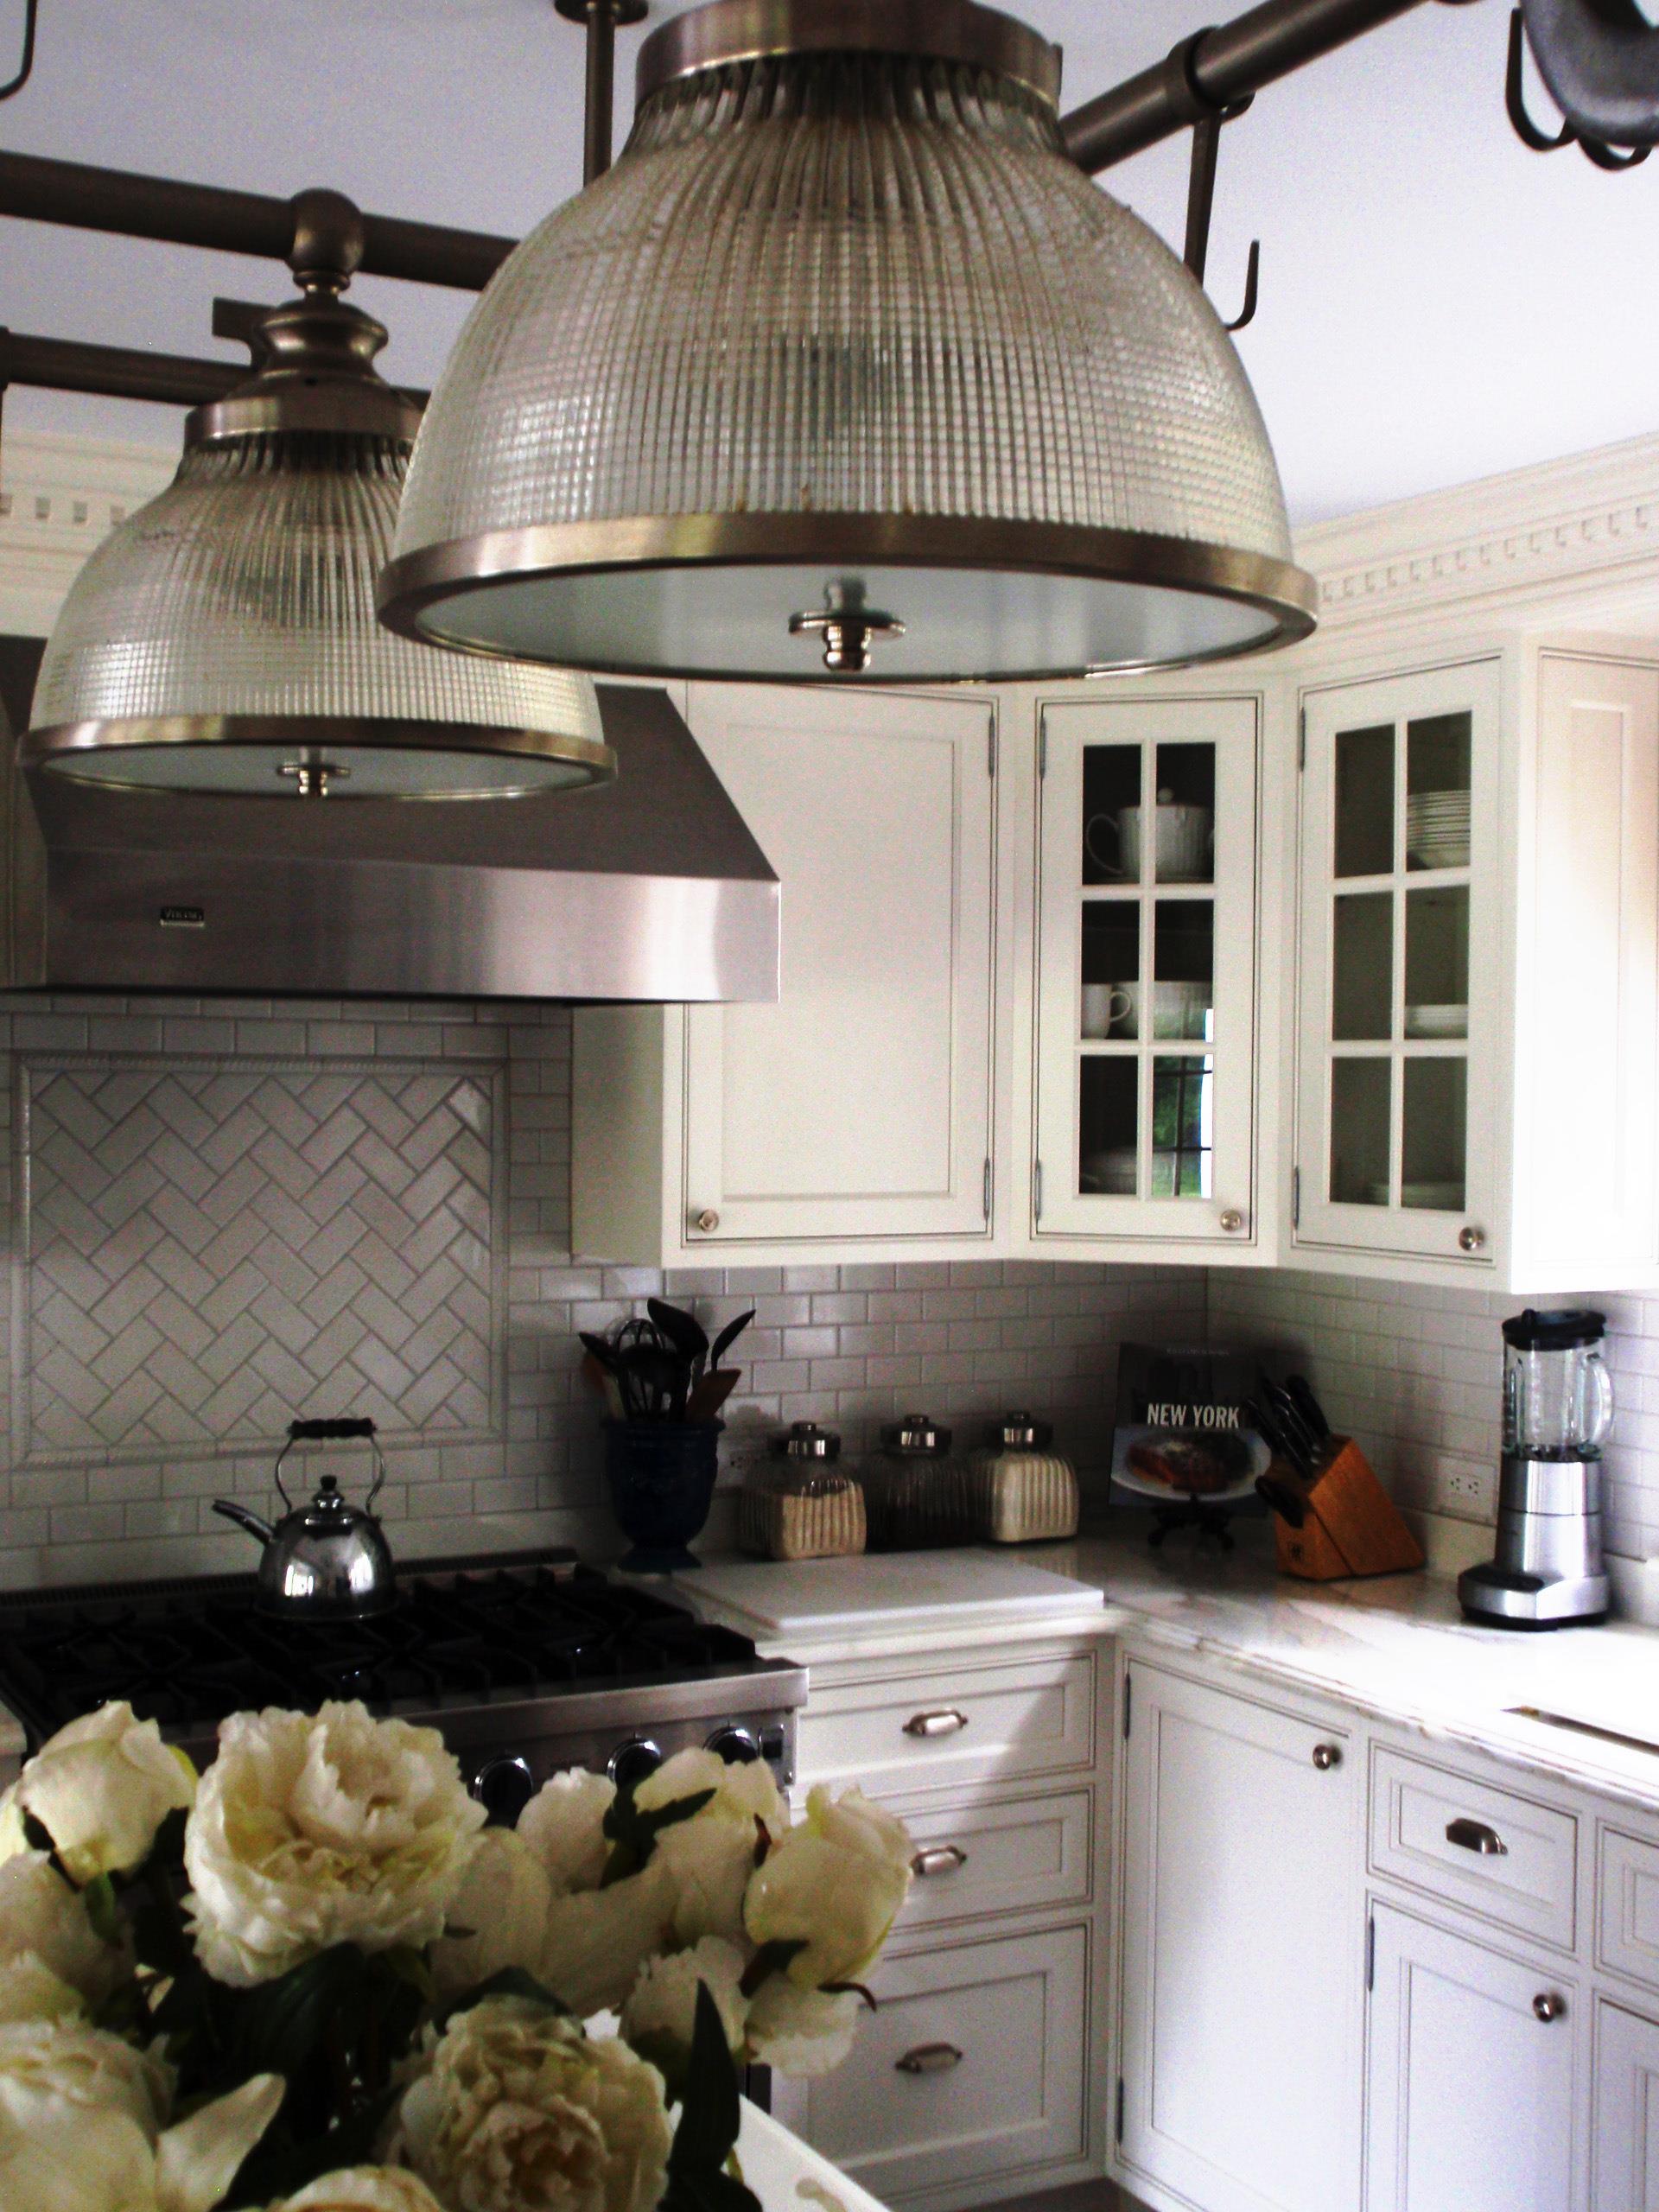 Maxine shriber interior design new york in new york ny for Interior design companies in new york